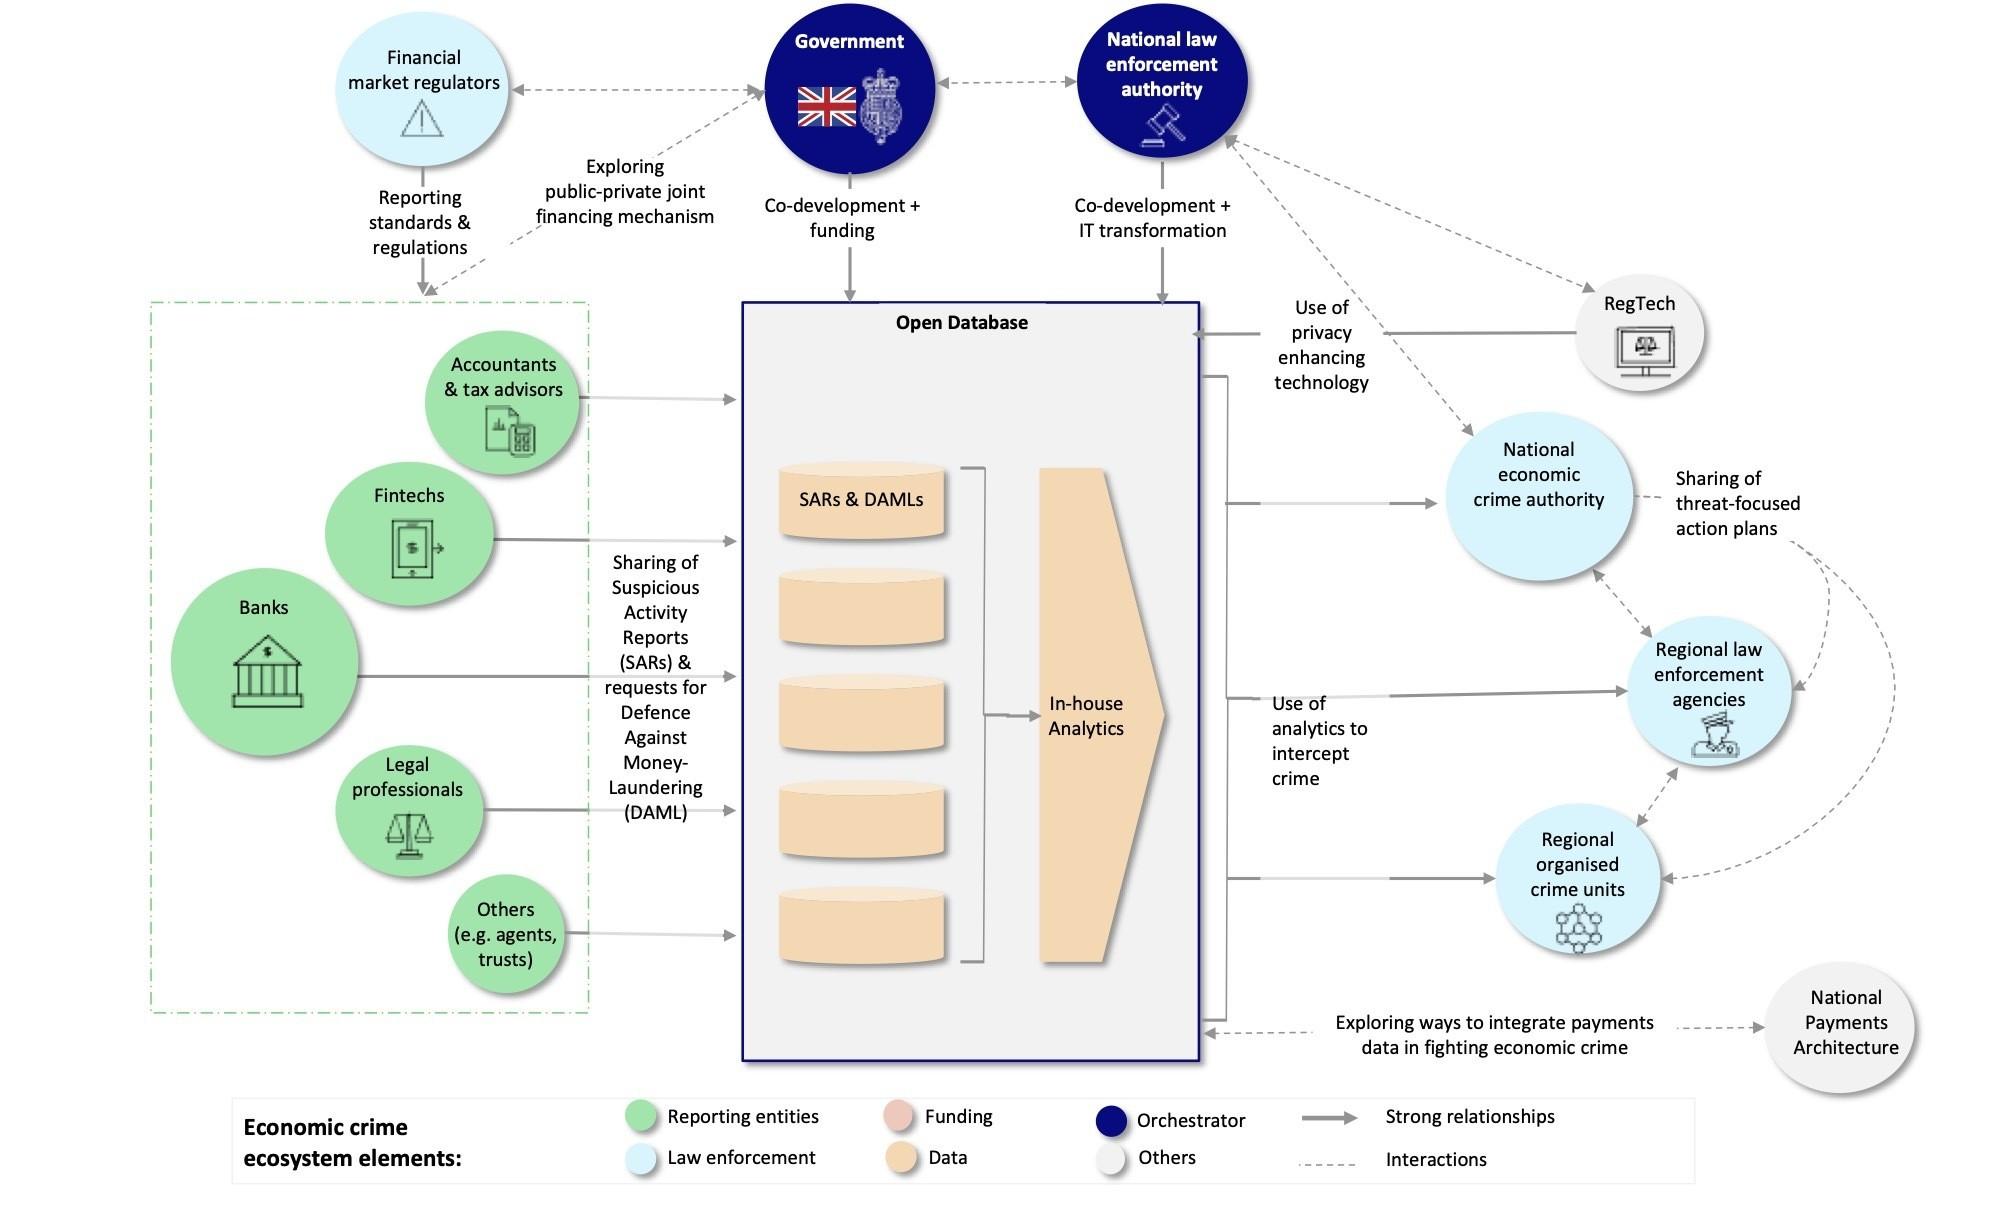 Figure 3. UK SARs reform ecosystem collaborators and contributions.